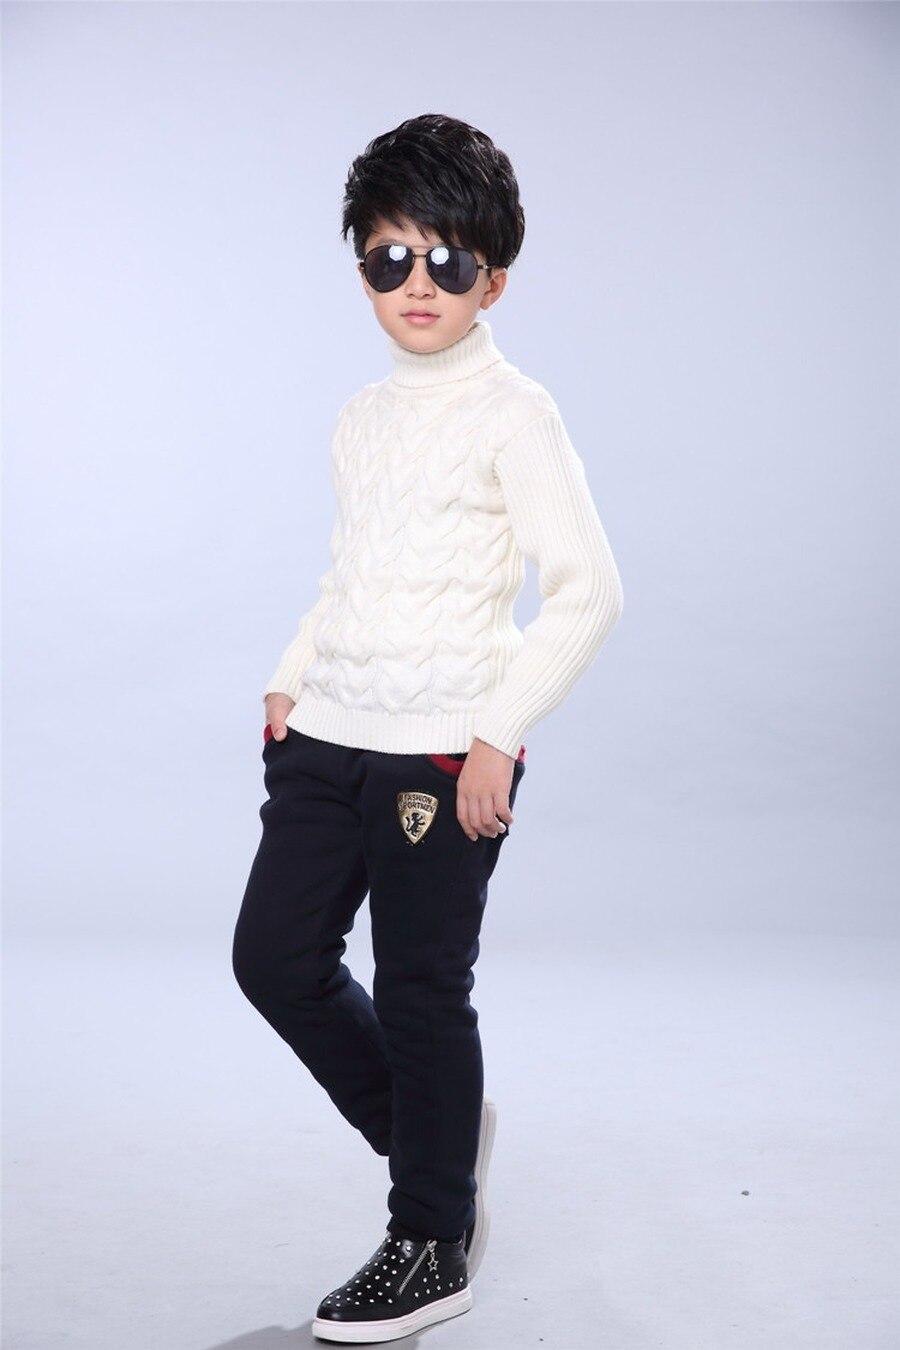 Winter Pants for Boy Kids Warm Thick Fleece Fur Lining Leggings Sport Trousers 4Y-14Y Teen Boys Straight Full Leggings Joggers 6